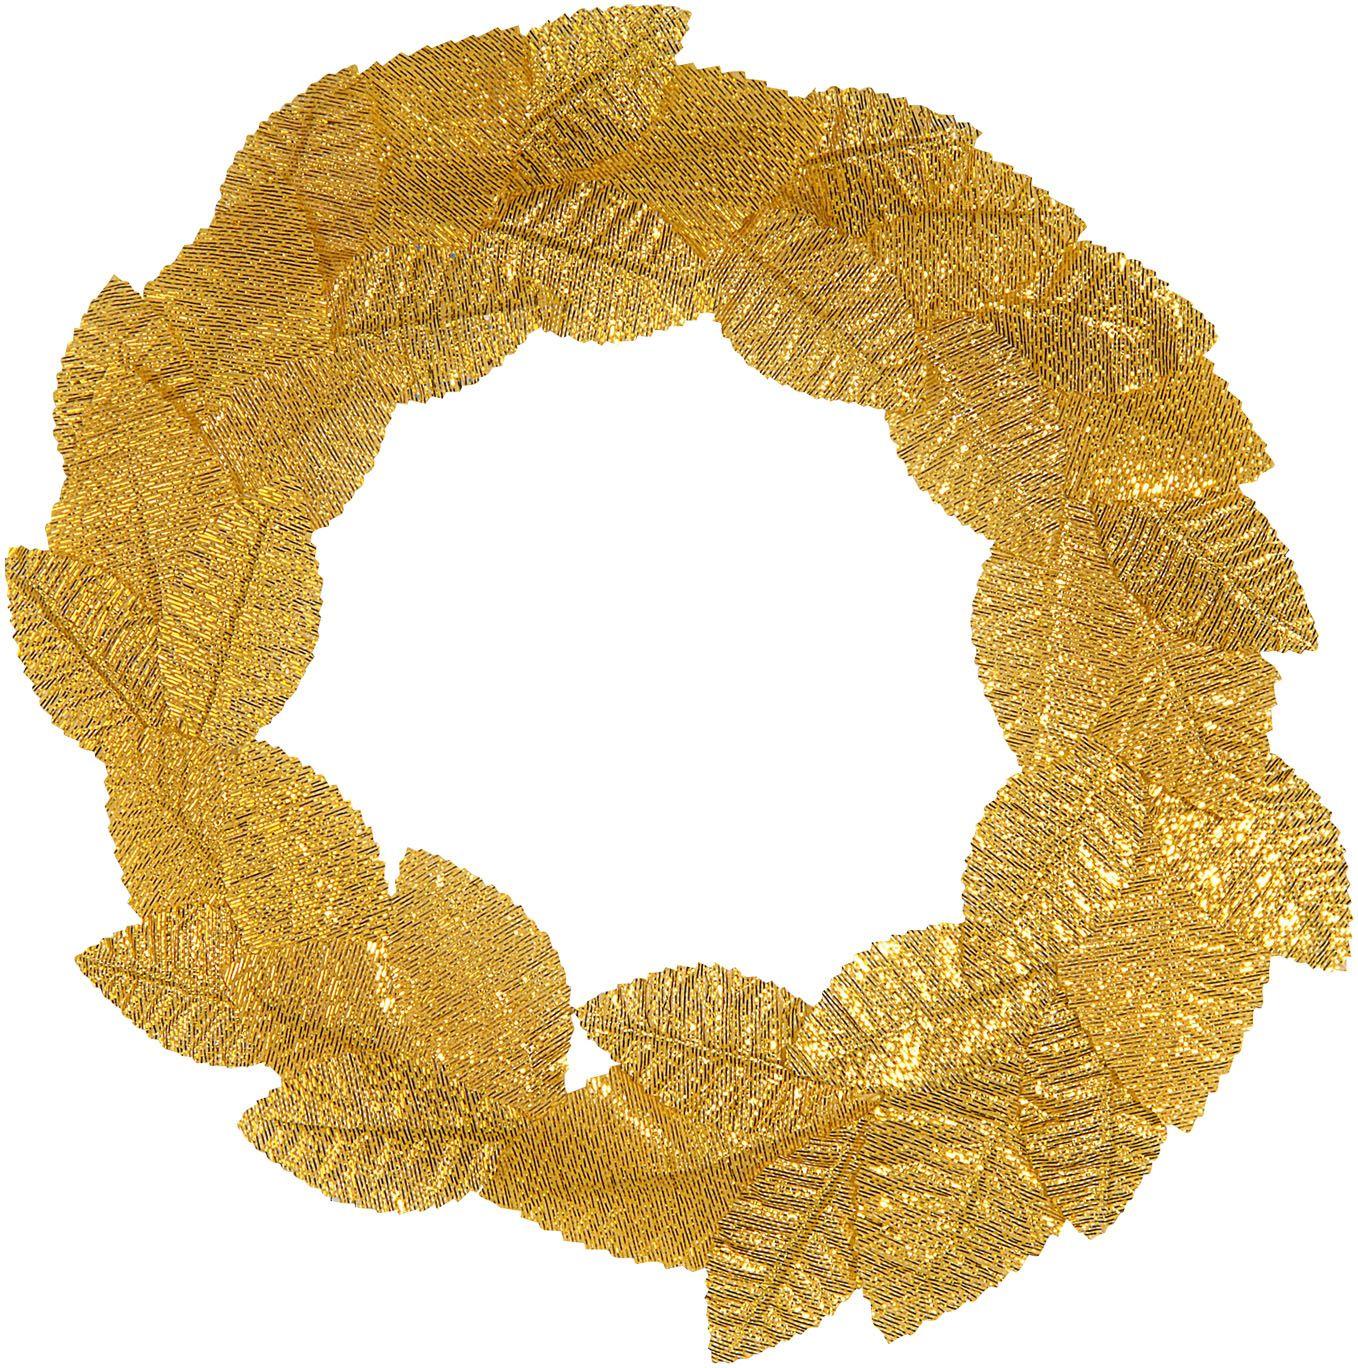 Gouden laurierblad hoofdkrans